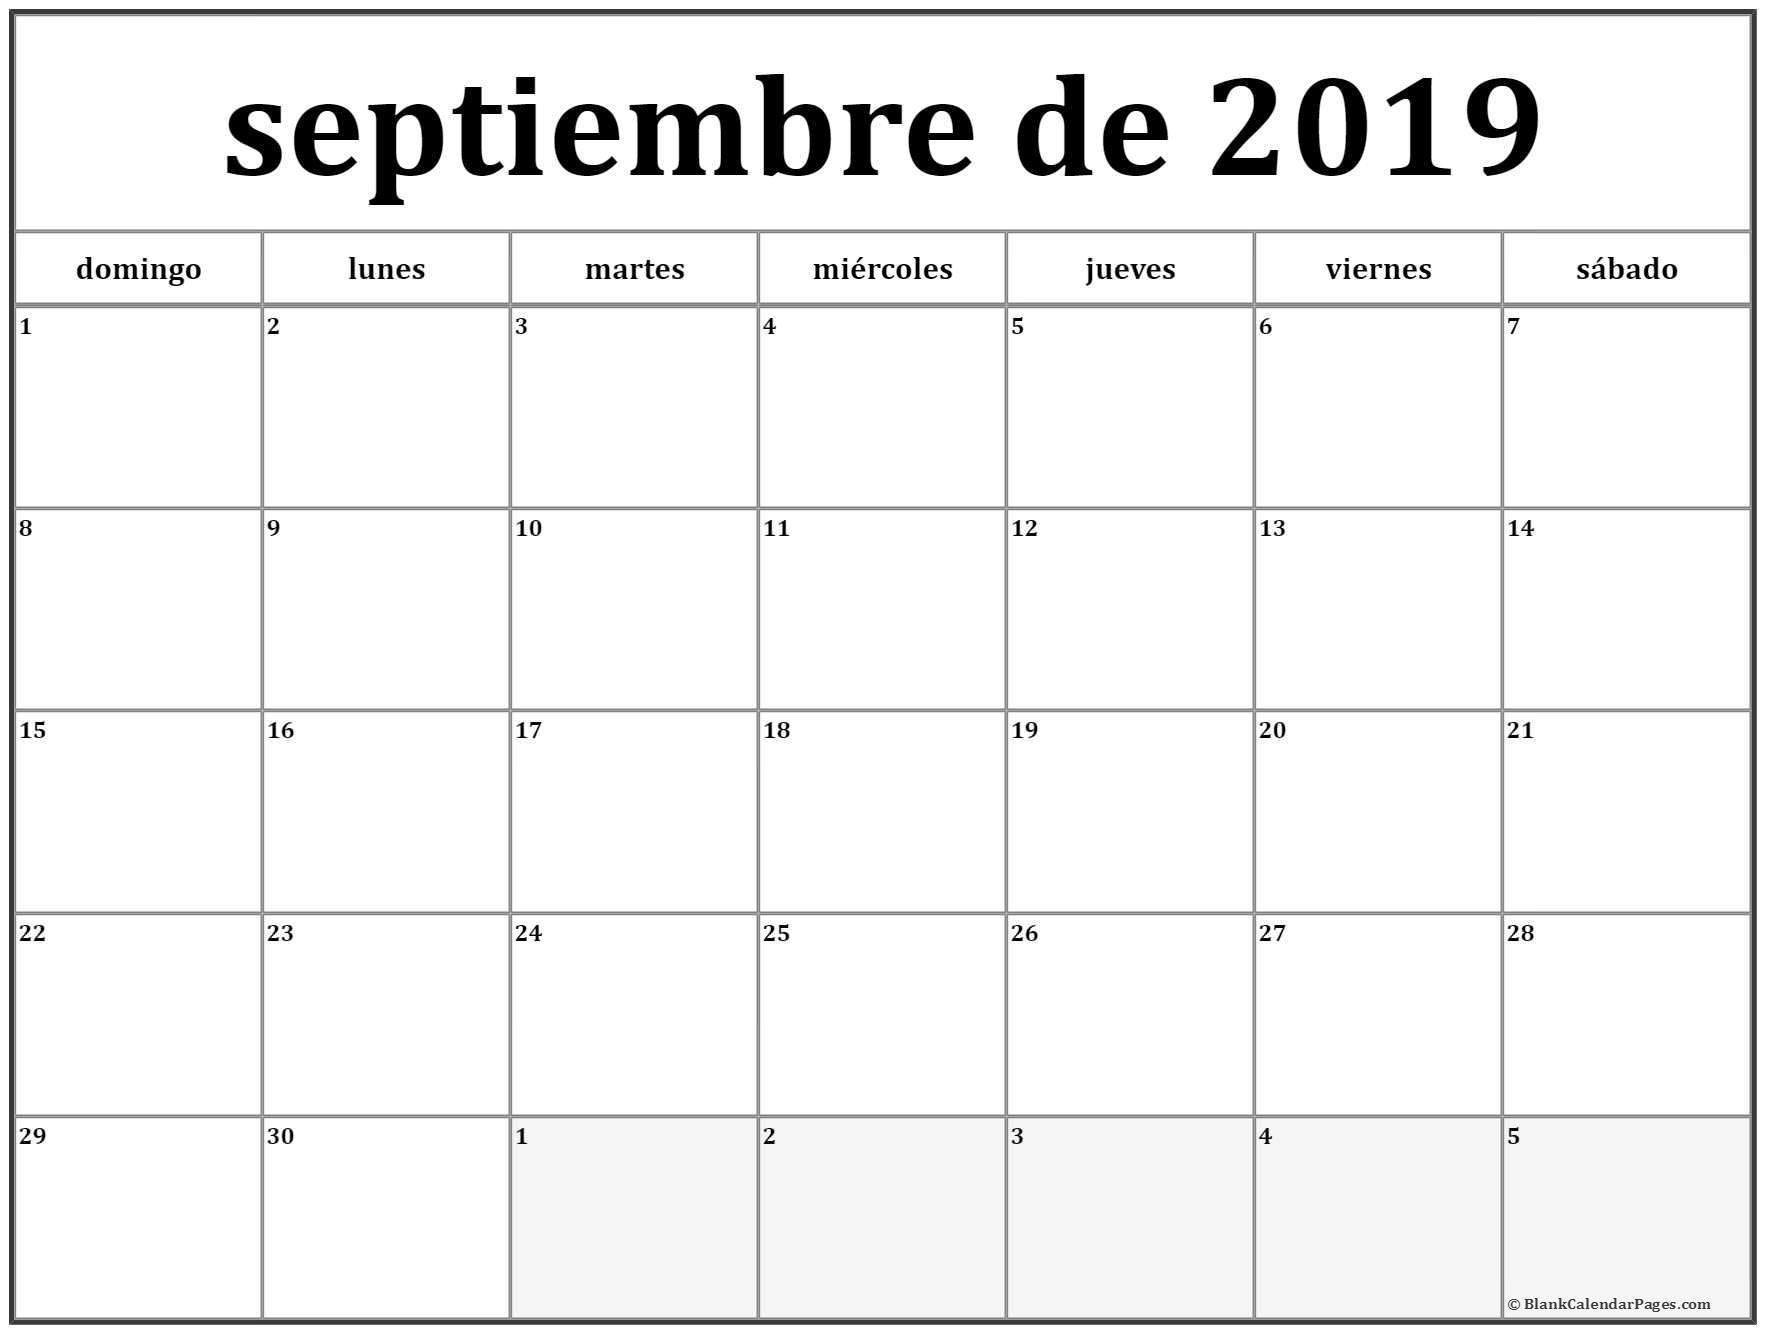 septiembre de 2019 calendario imprimible